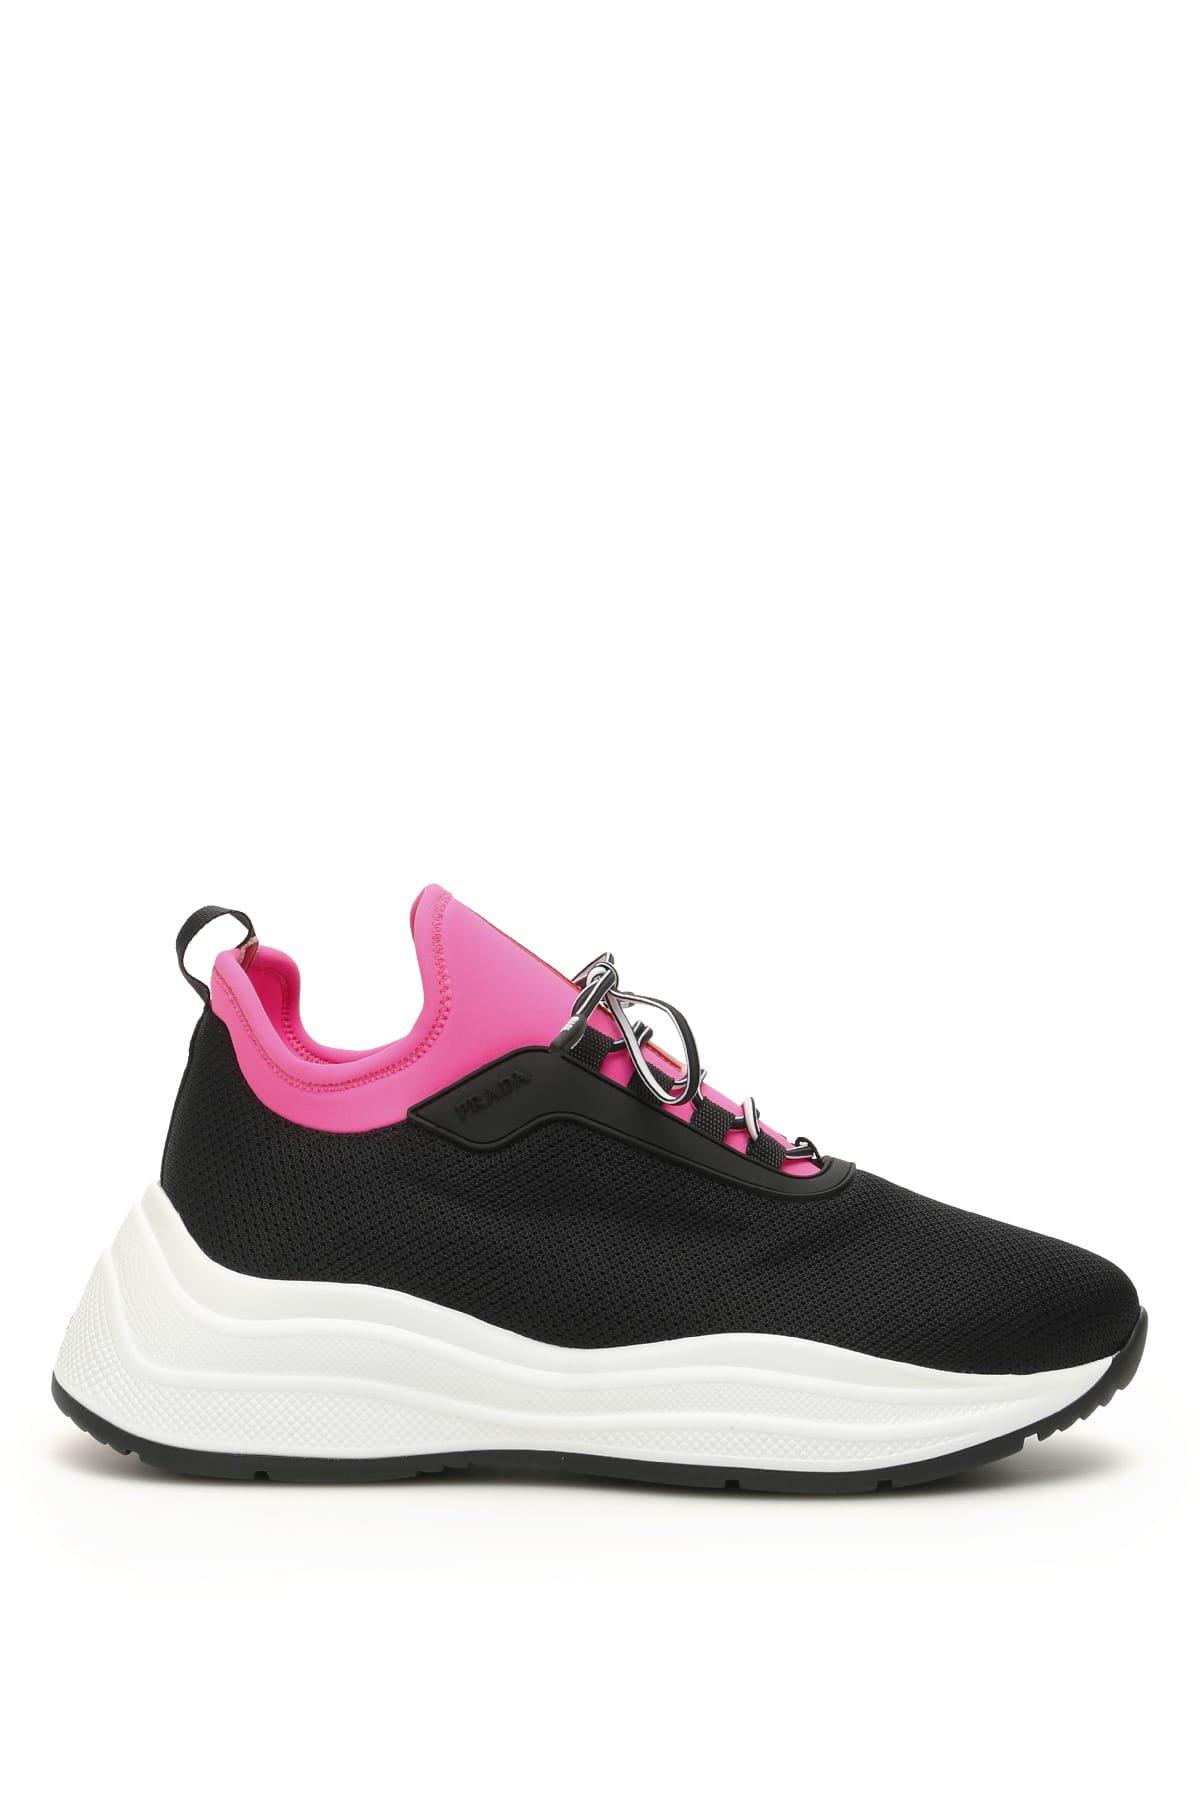 Prada Mesh Slip On Sneakers